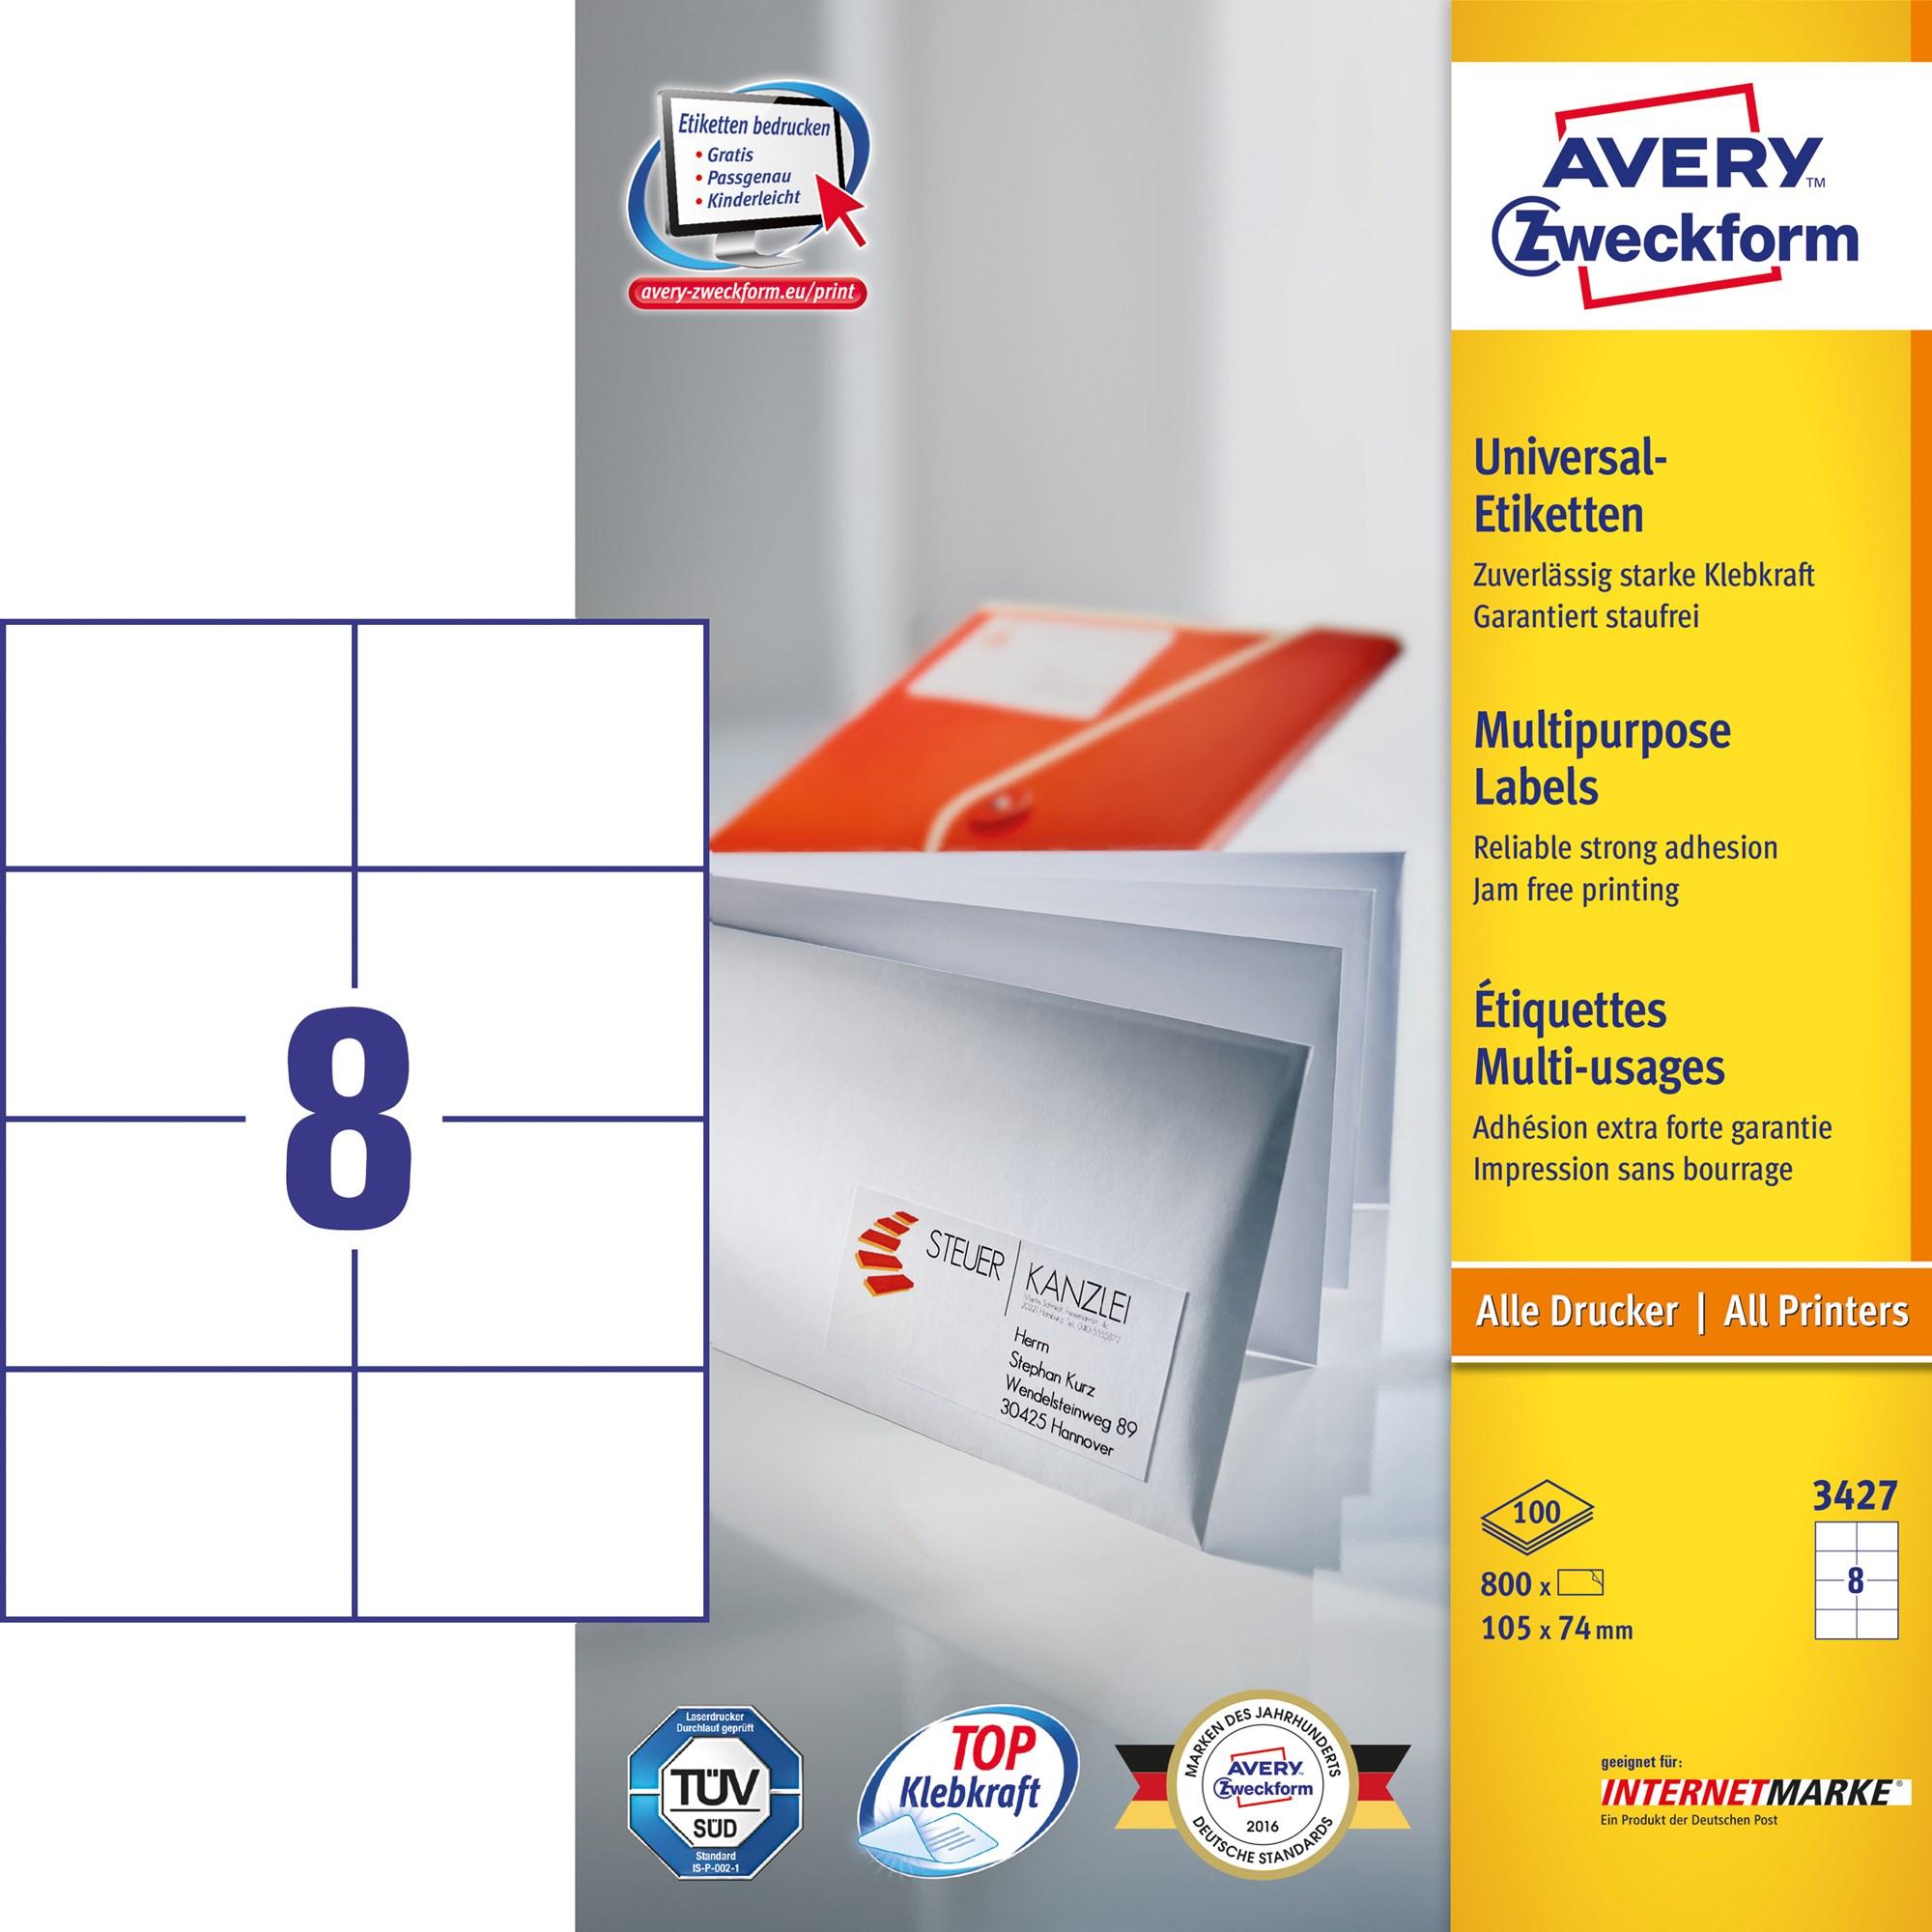 Image of Avery ILC universal etiket 105x74mm (800)